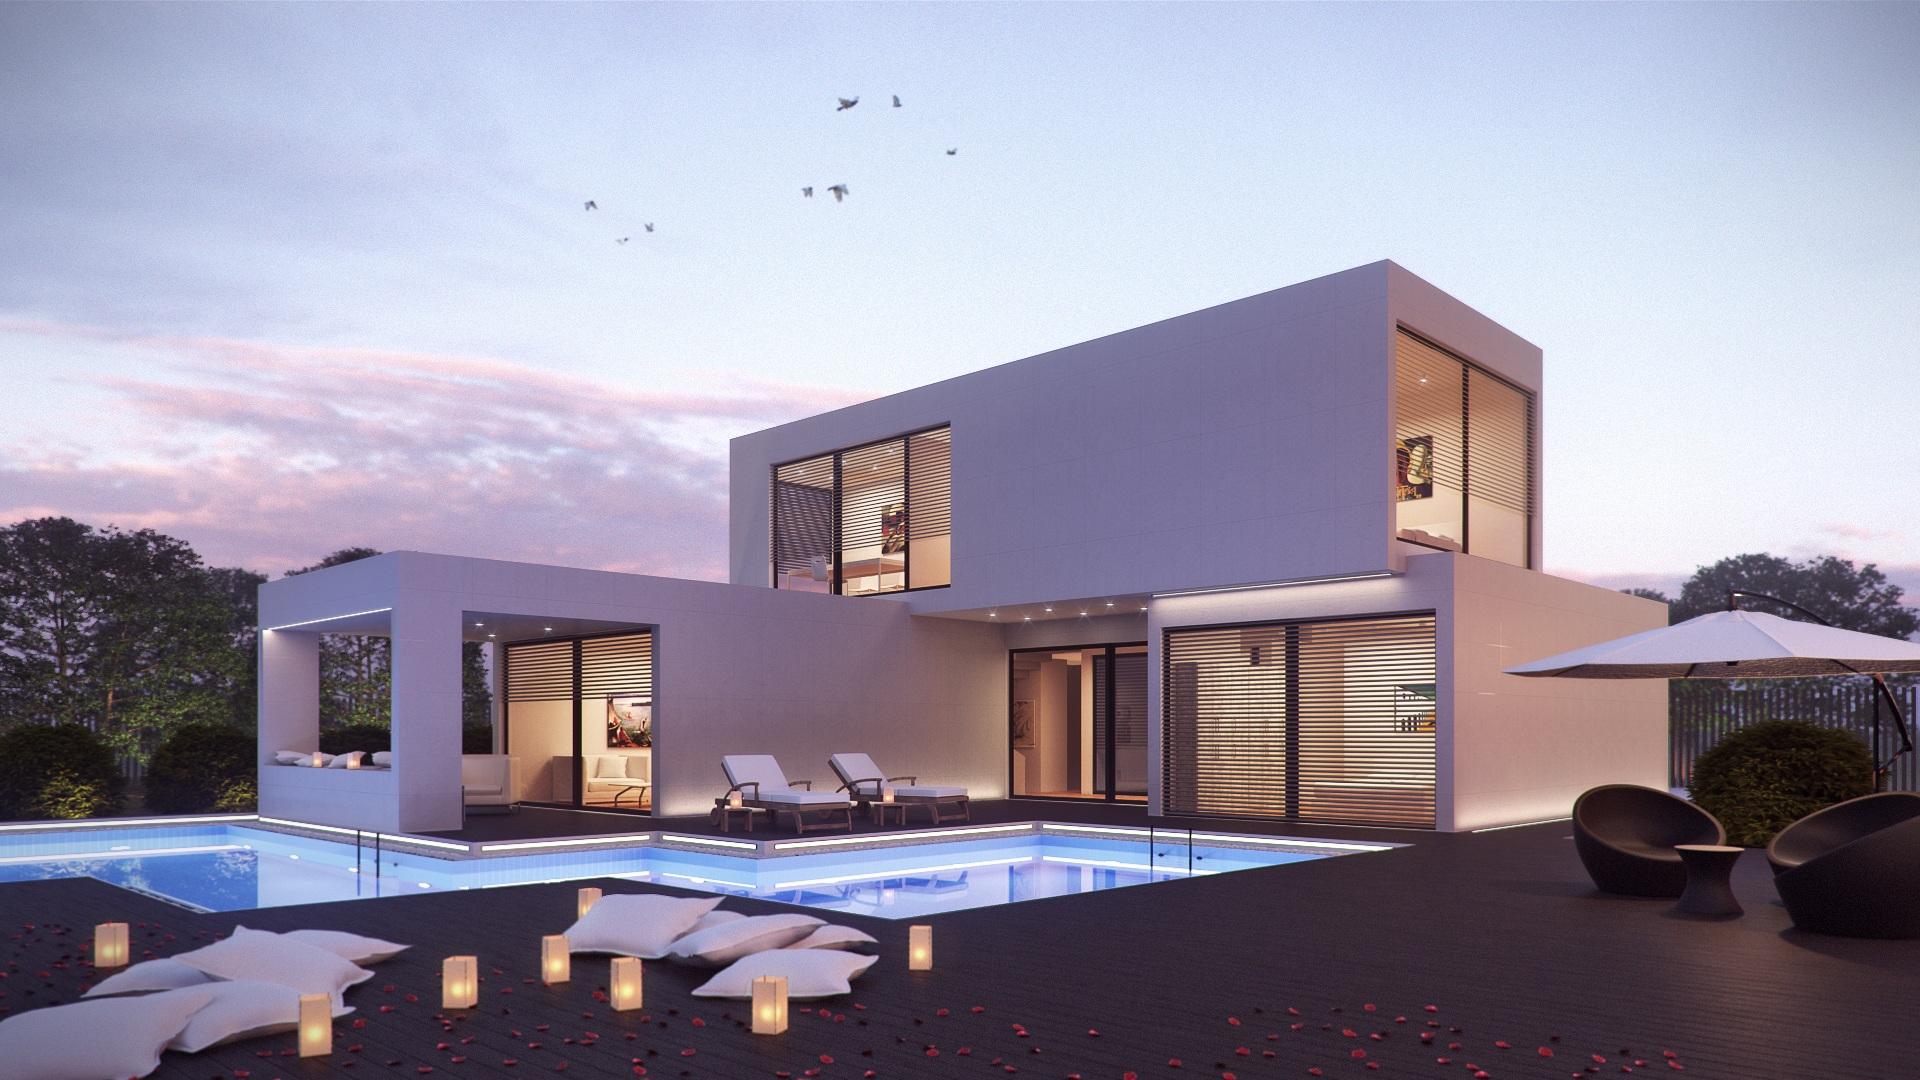 Beautiful ... 3d, Graphics, Hacienda, Condominium, Real Estate, Prefabricated House,  Holiday Home, 3dsmax, Crown Render, Modular Home, Modulate, External Design,  ...